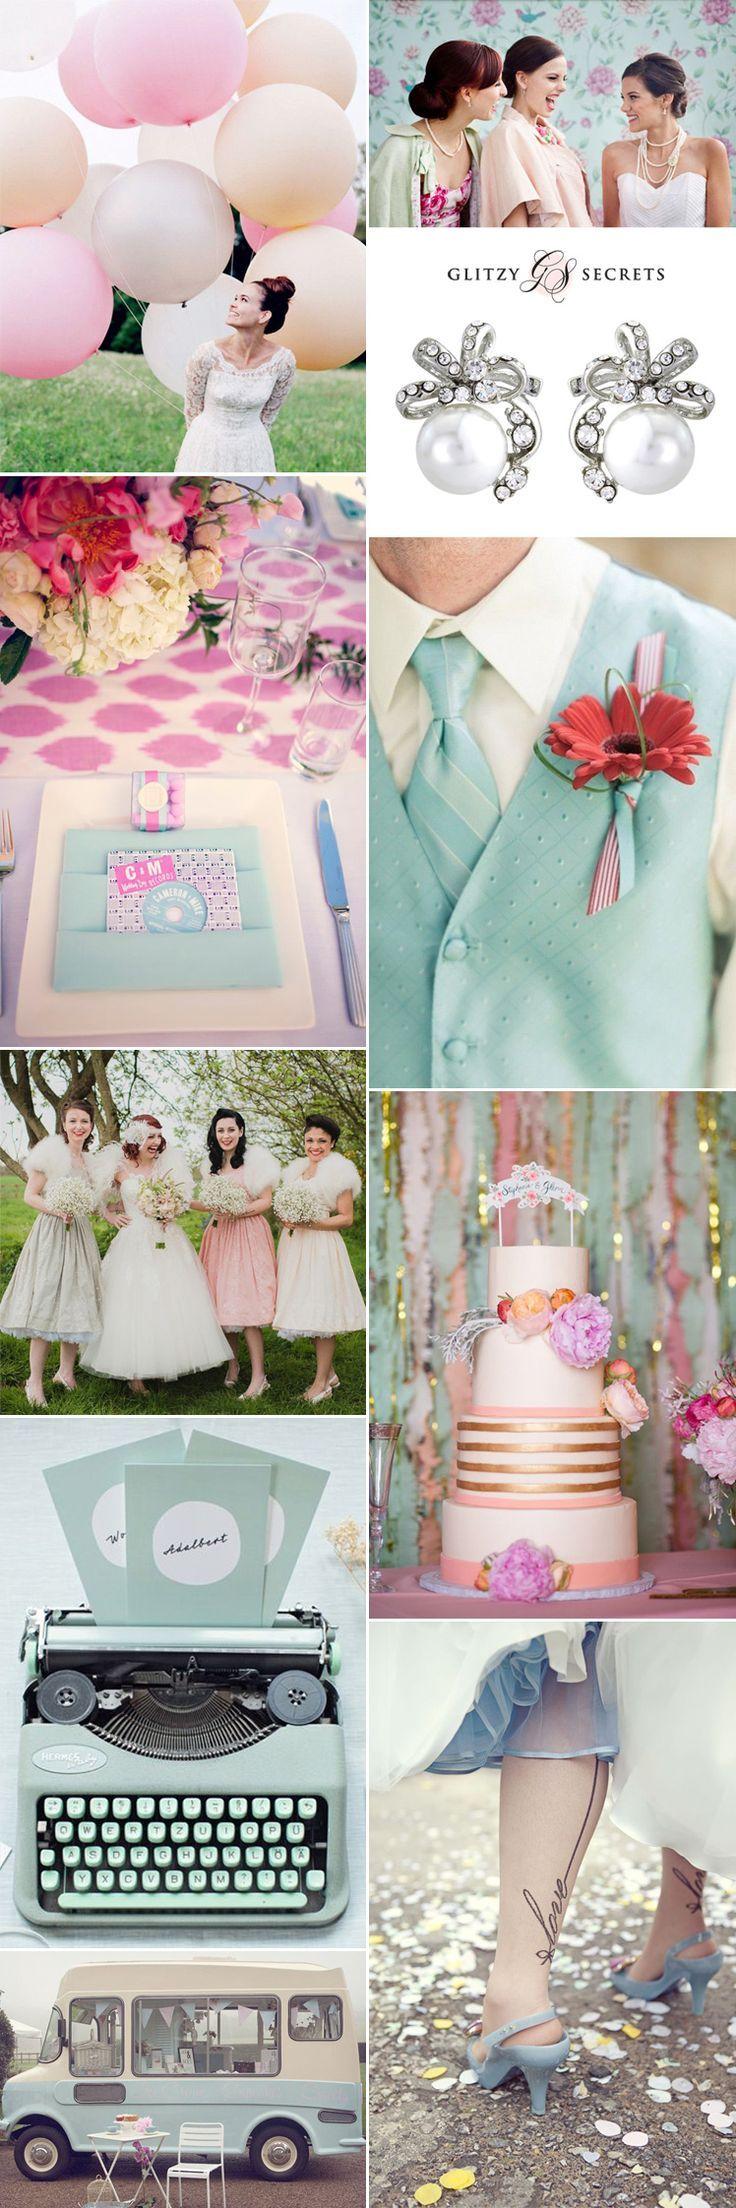 Pastels And Petticoats 1950s Wedding Ideas Pinterest 1950s